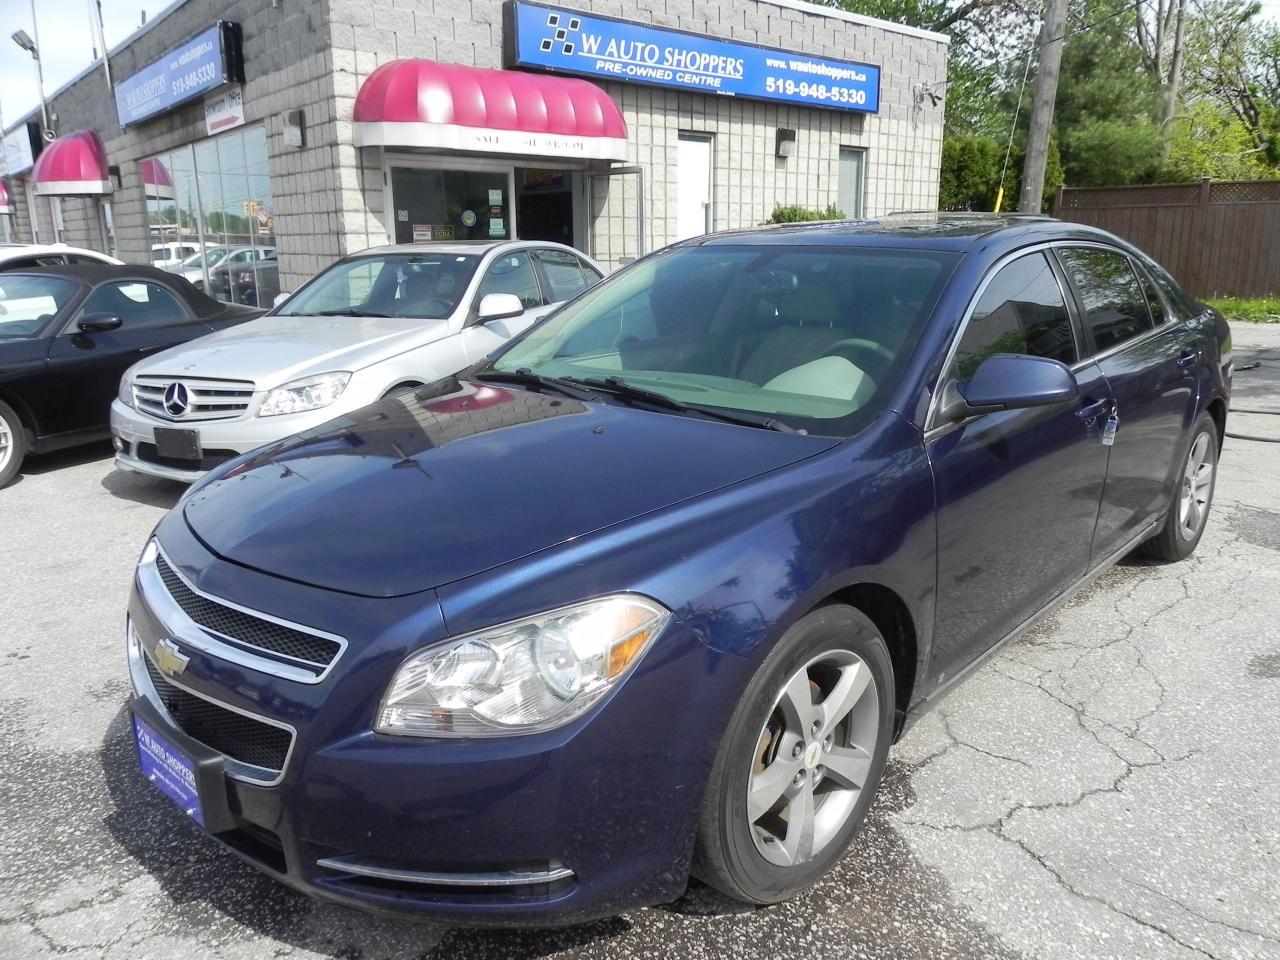 Photo of Blue 2009 Chevrolet Malibu